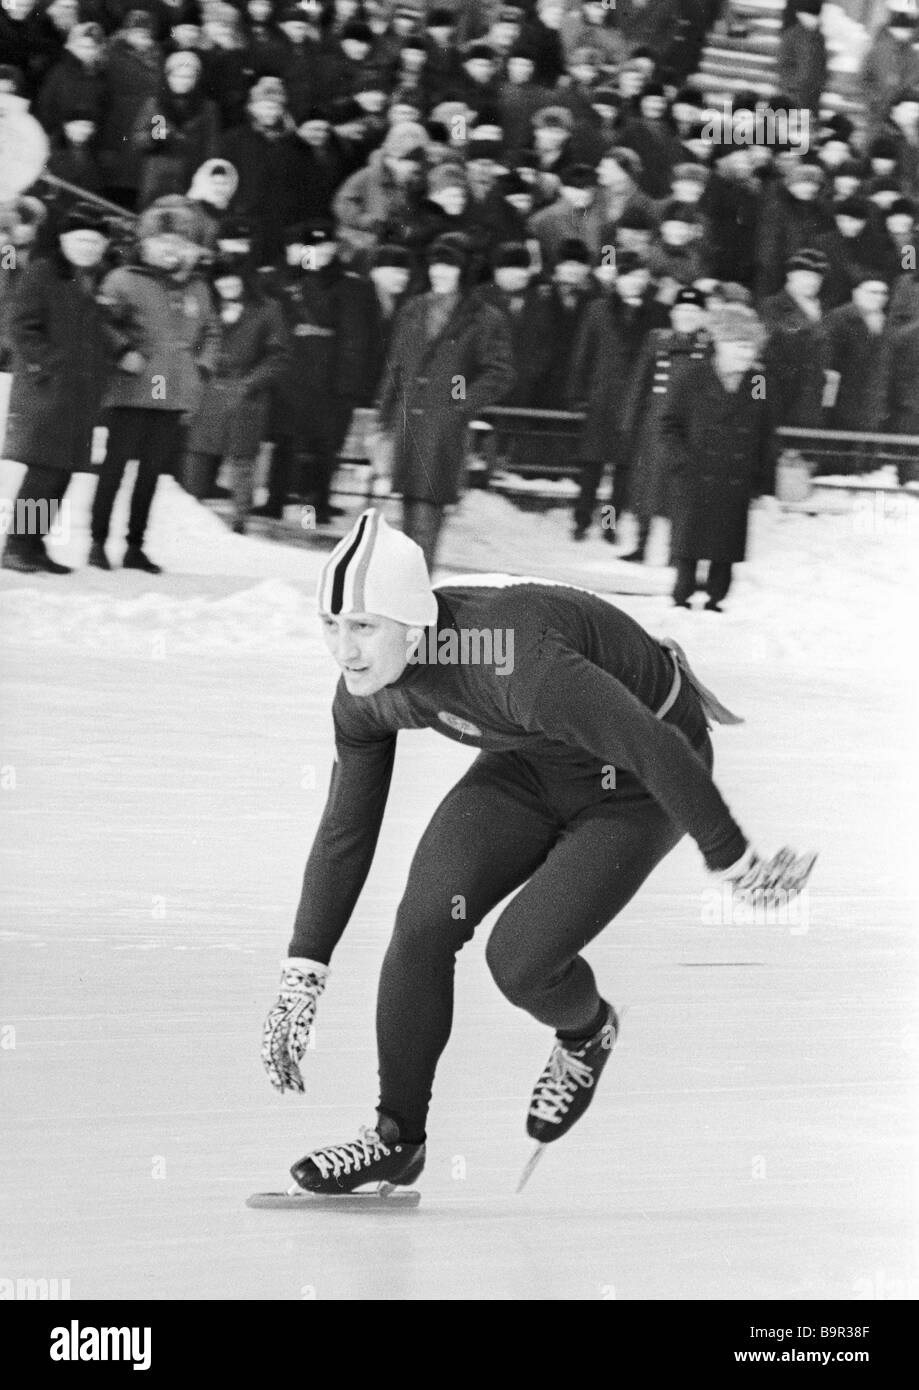 Pentathlon silver medallist Valery Kaplan at the USSR Peoples Winter Spartakiade - Stock Image